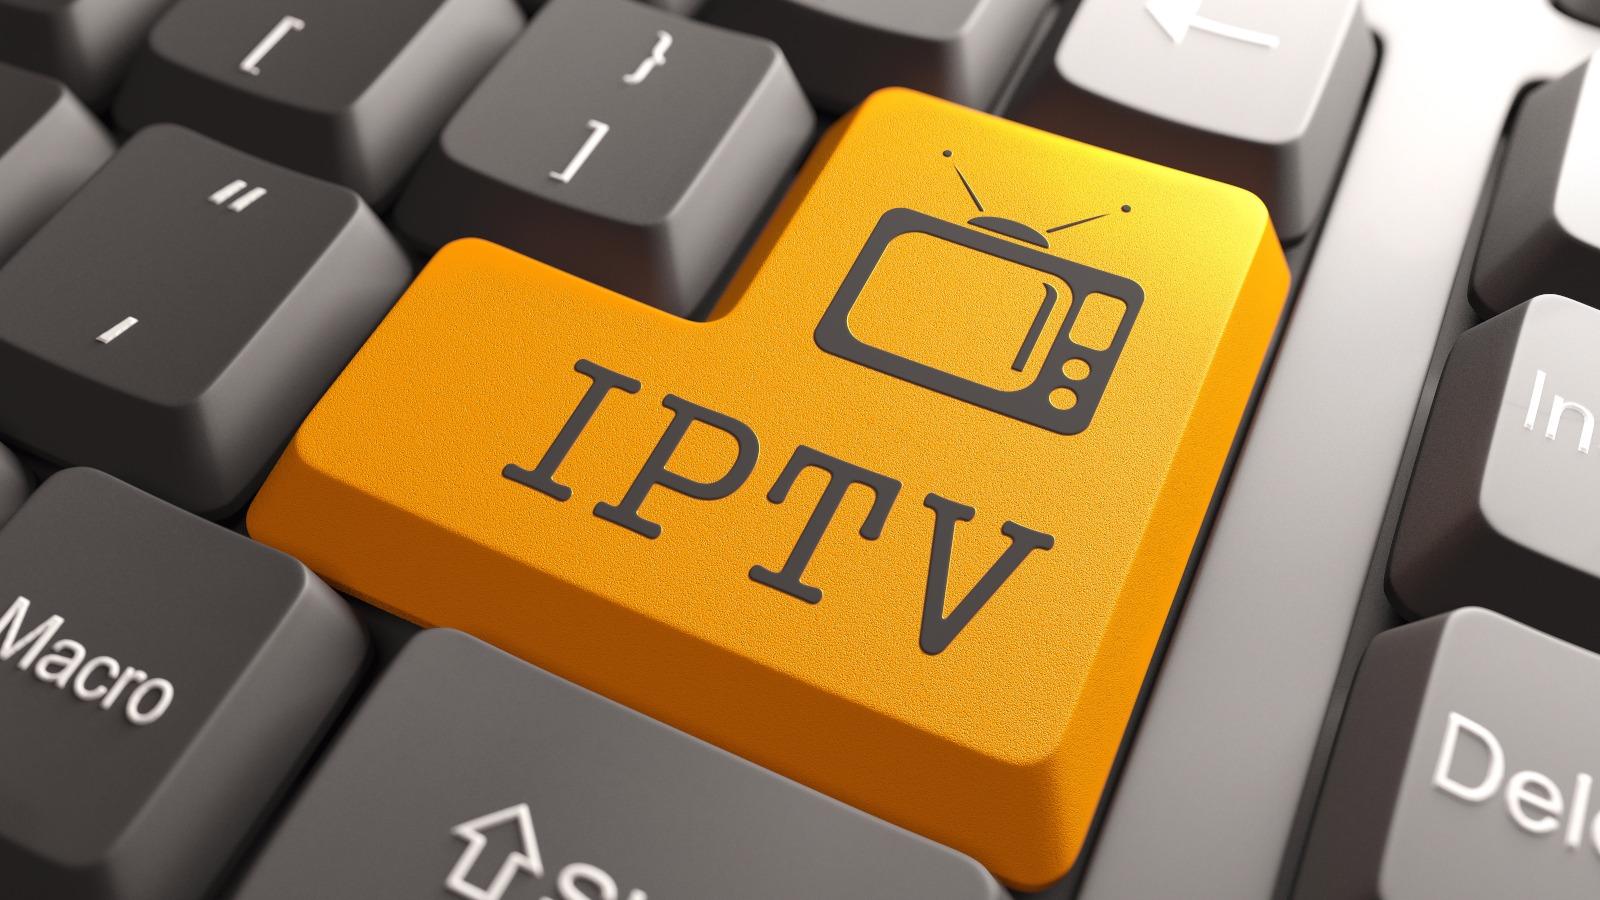 IPTV) Autoridades Portuguesas atentas à Pirataria? Já temos